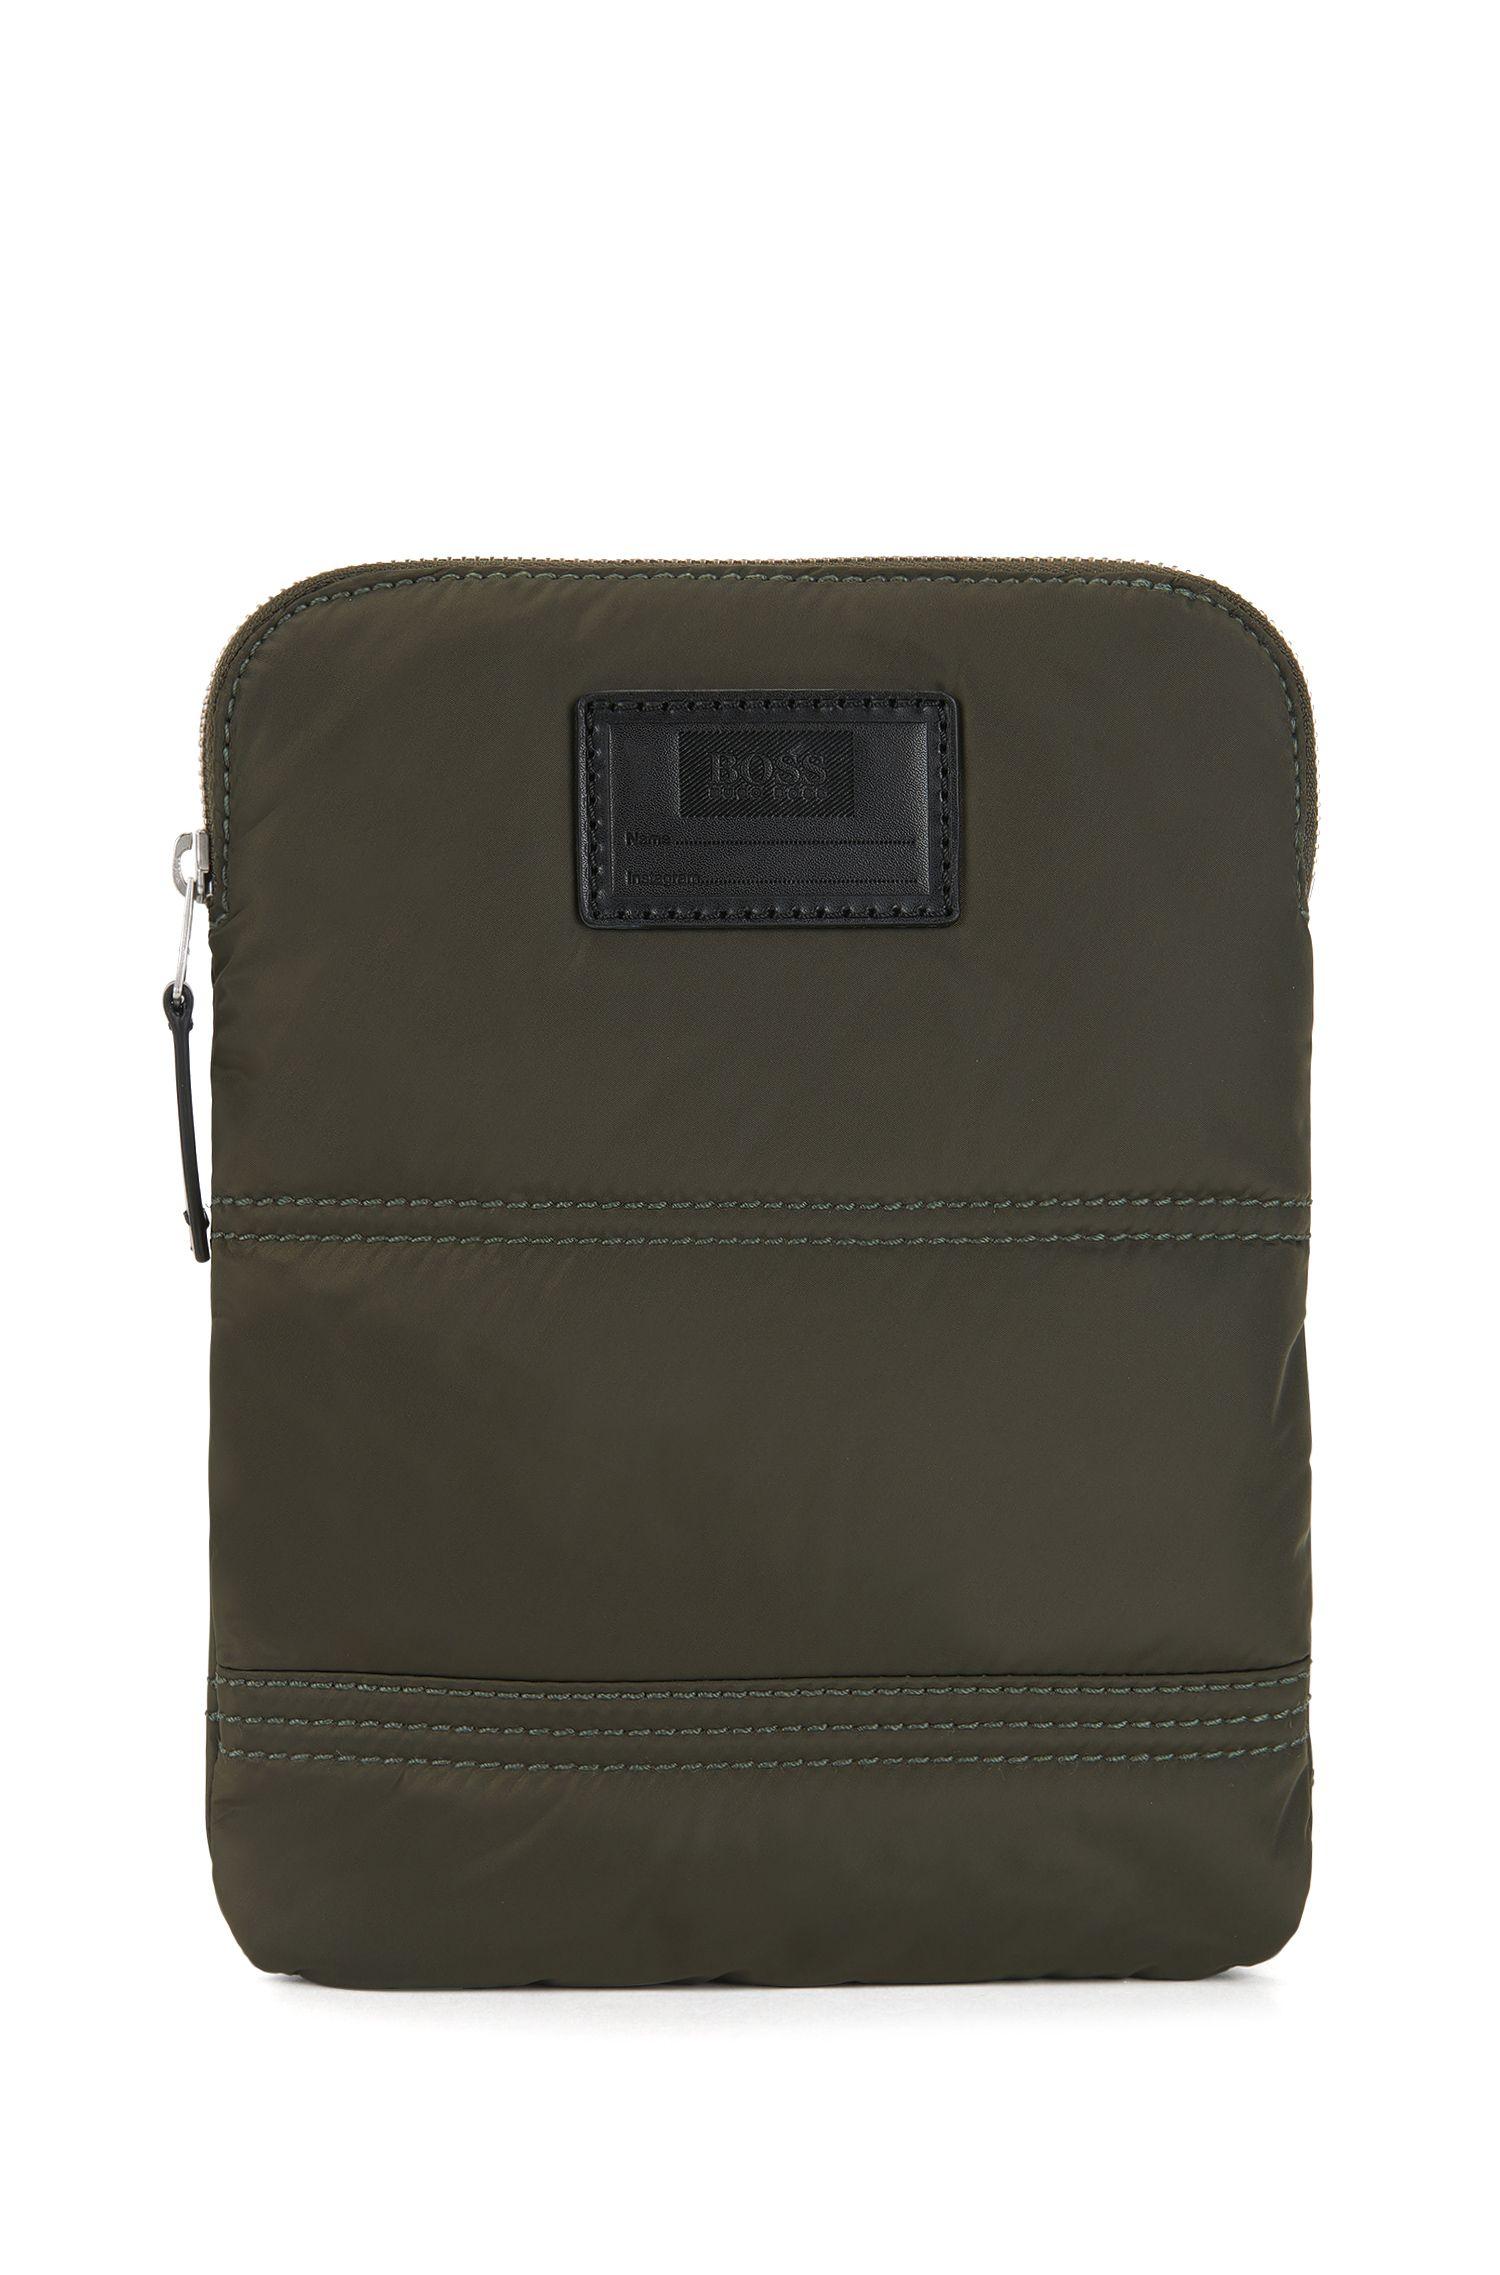 Cross-body tas van gewatteerde polyamide met aanpasbare patch